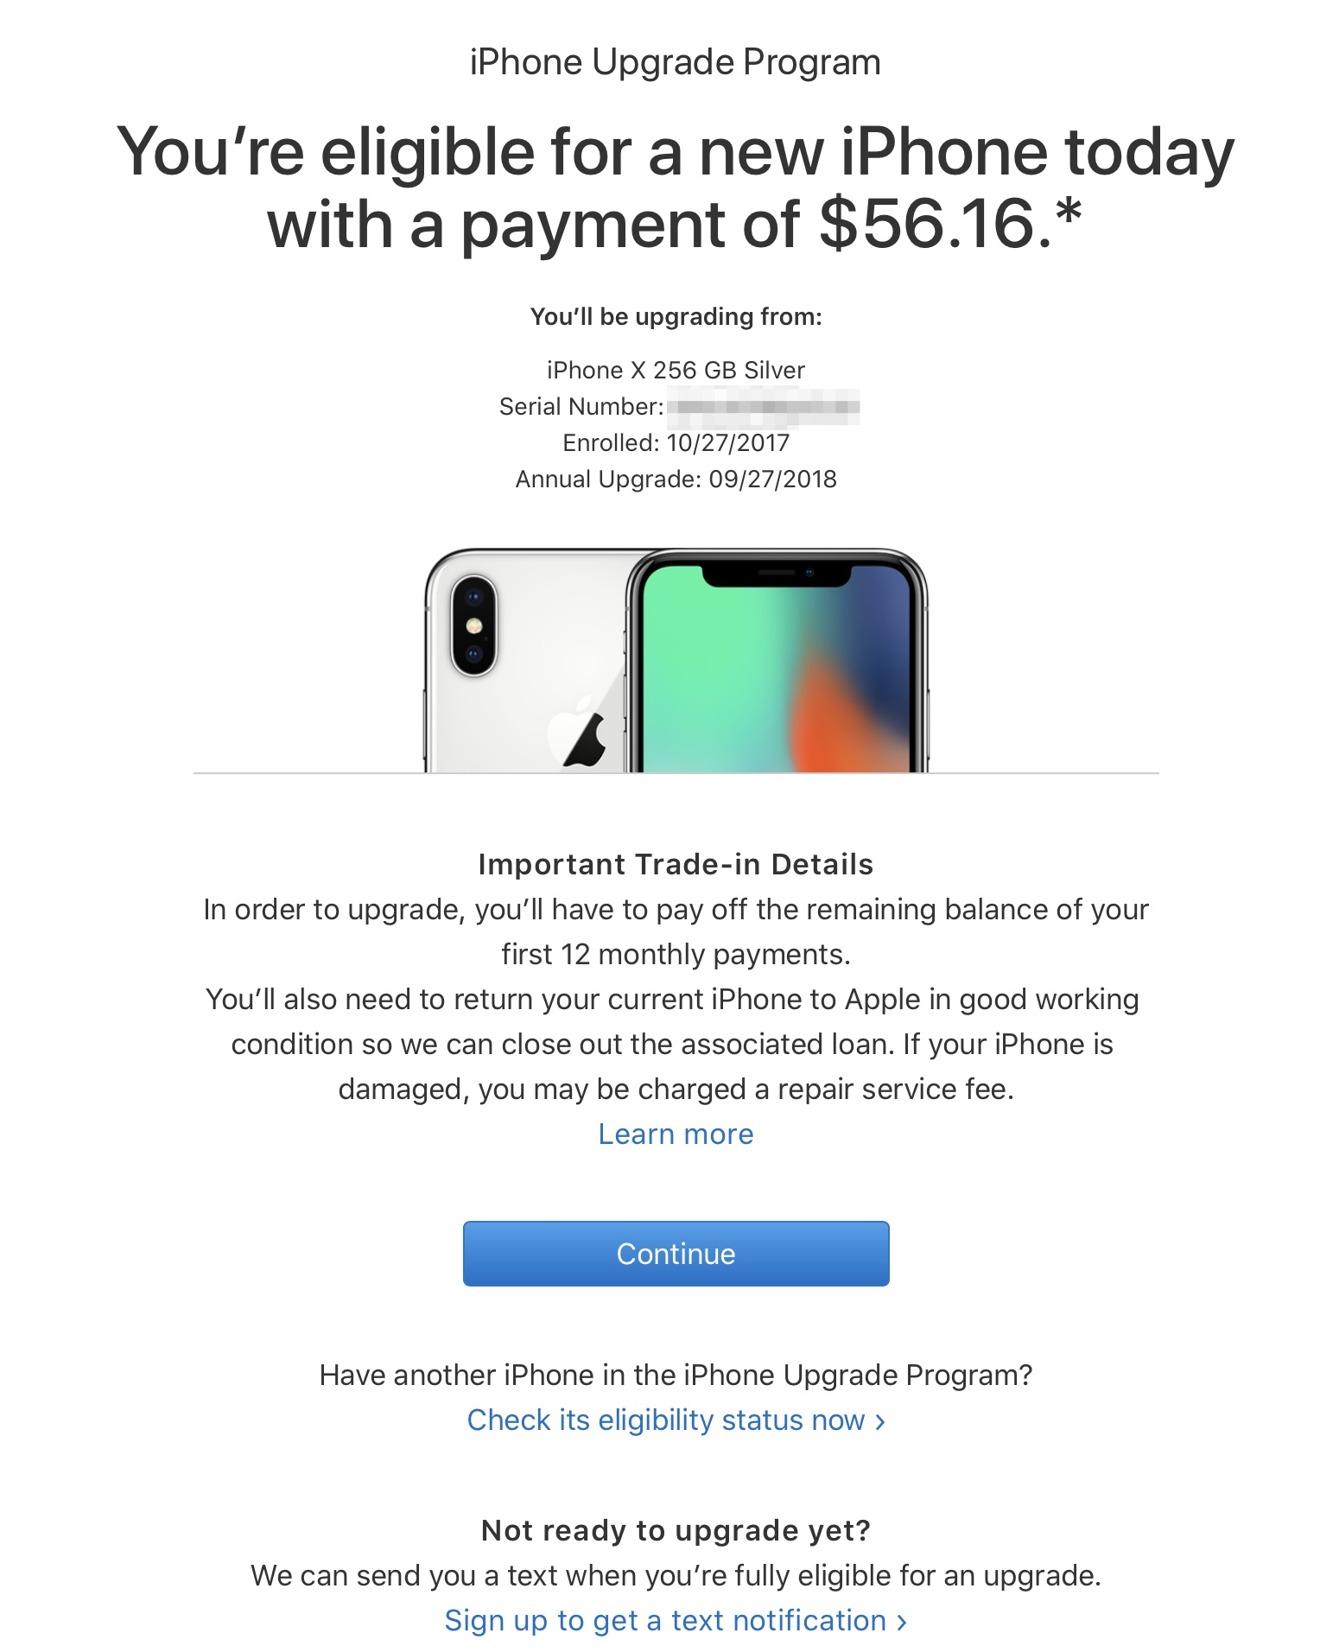 iPhone upgrade image